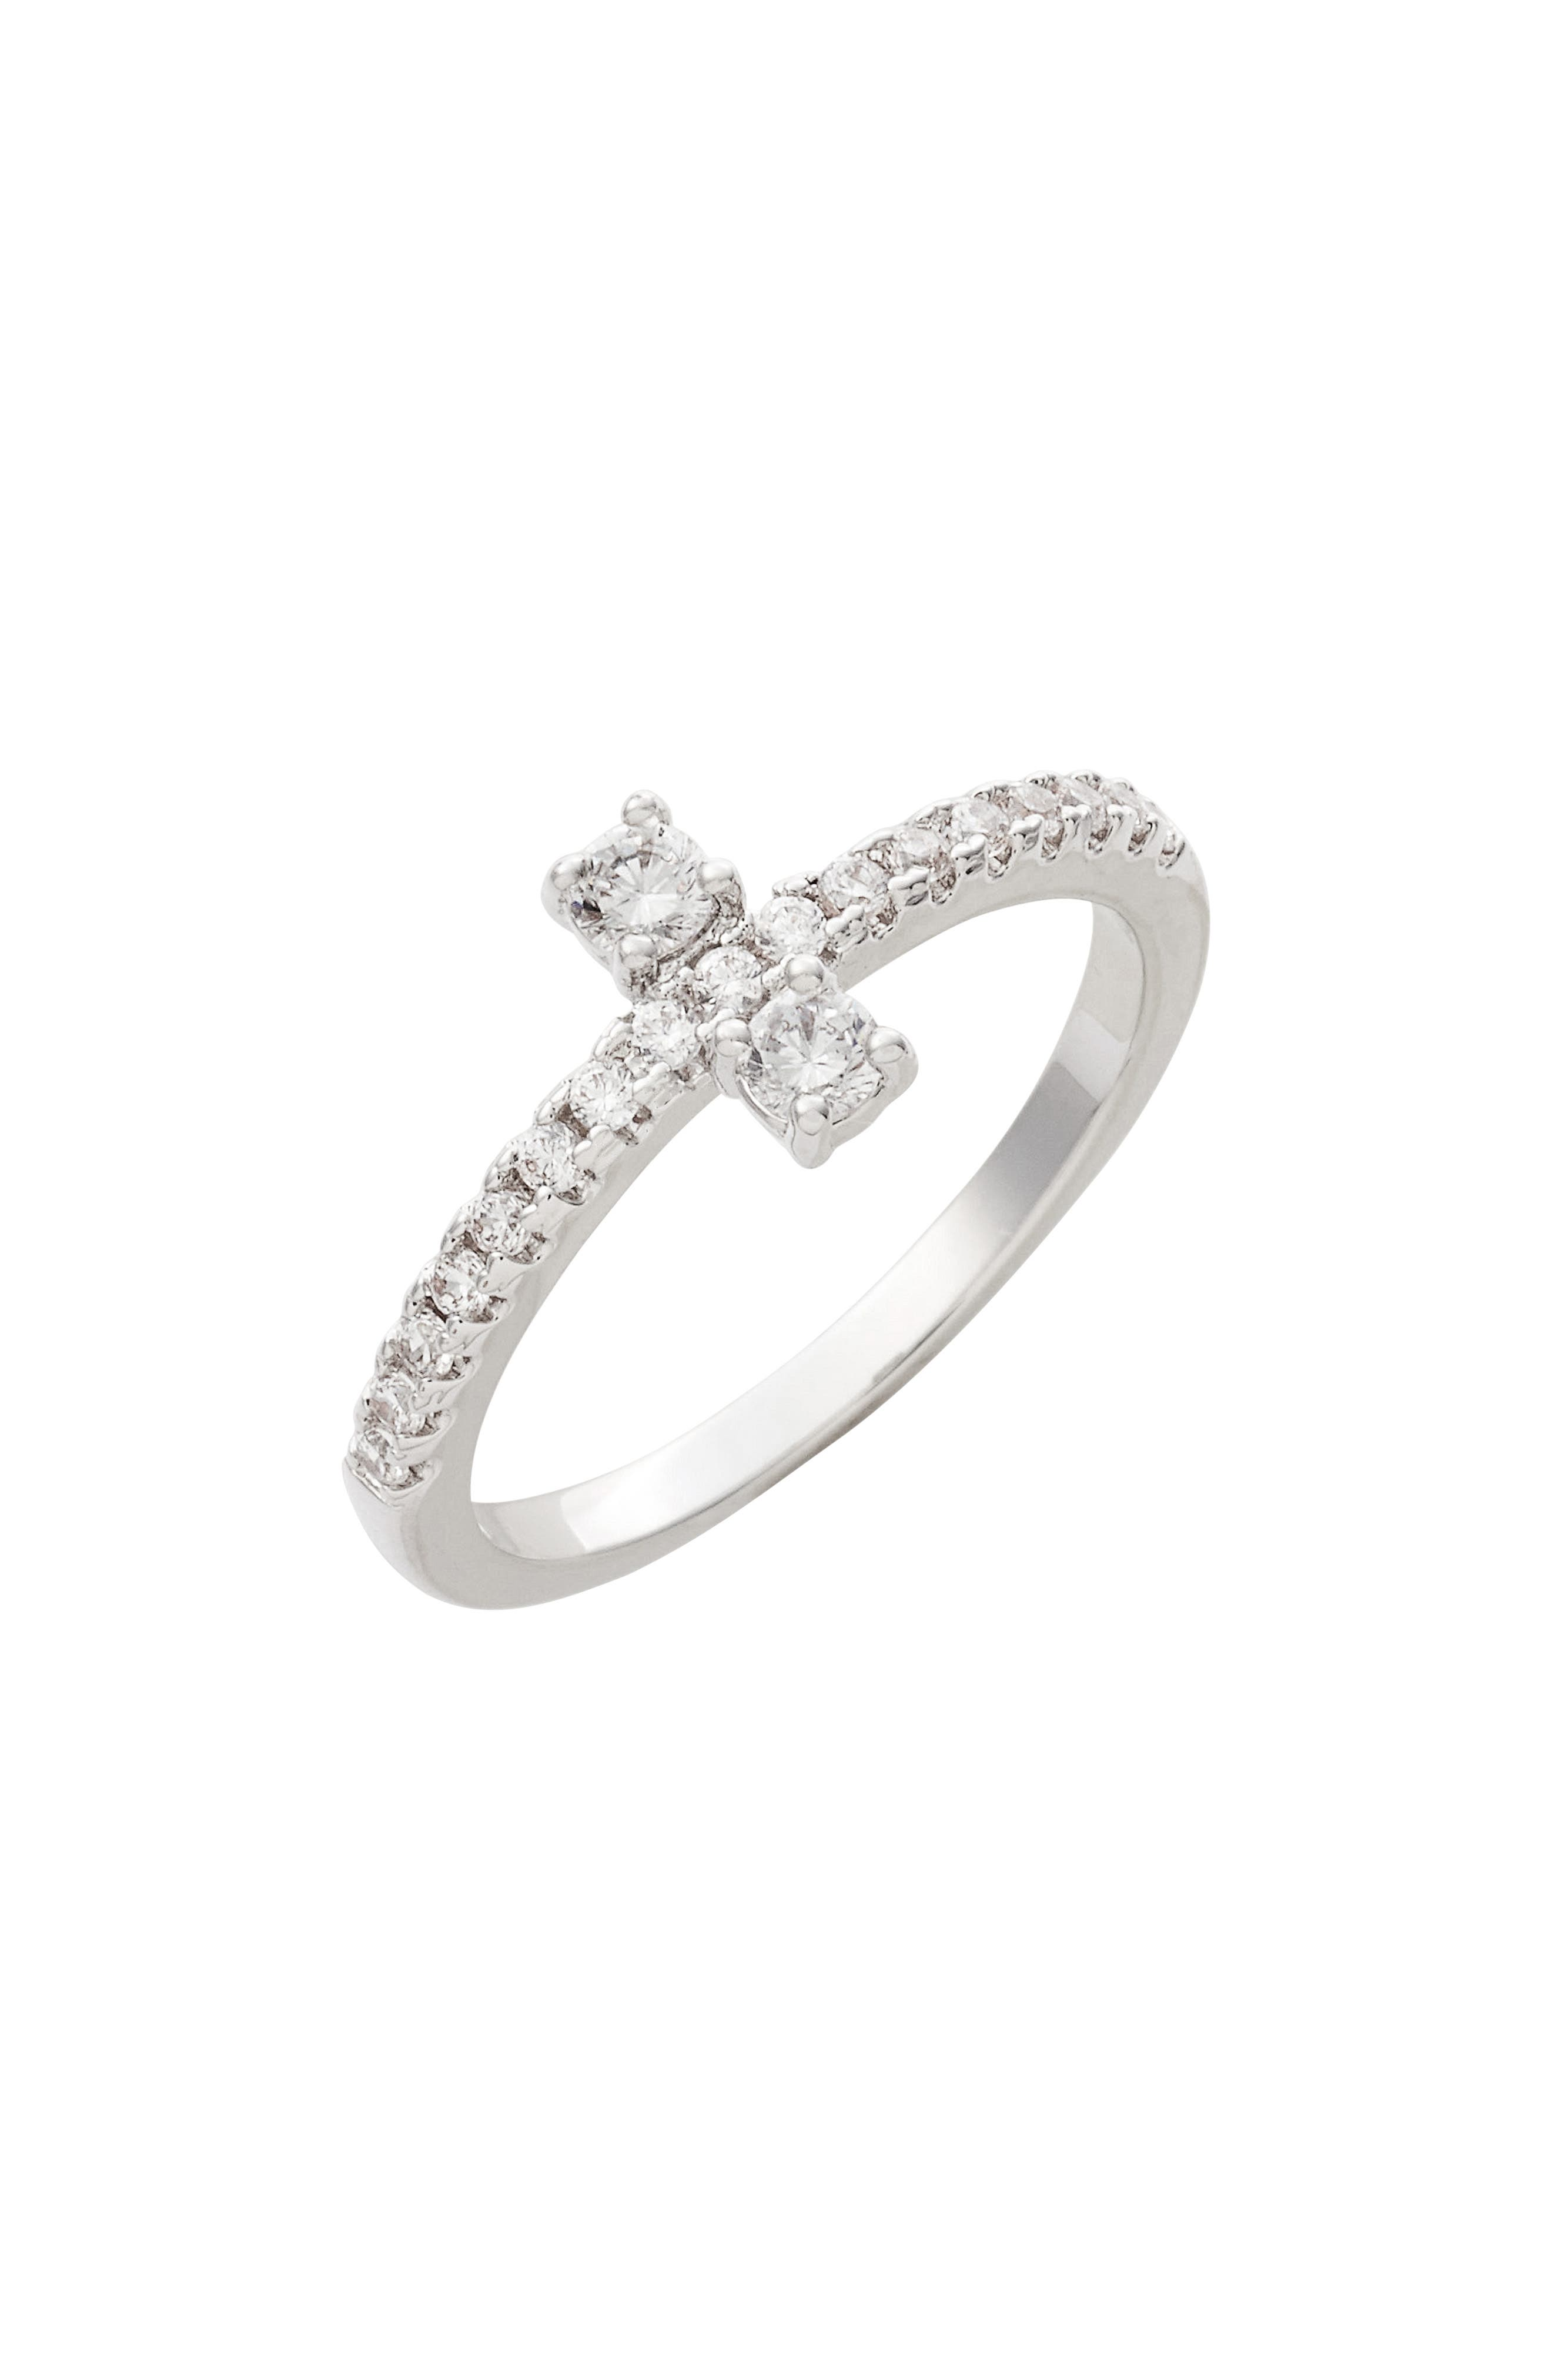 Margaret Cluster Ring,                         Main,                         color, Silver